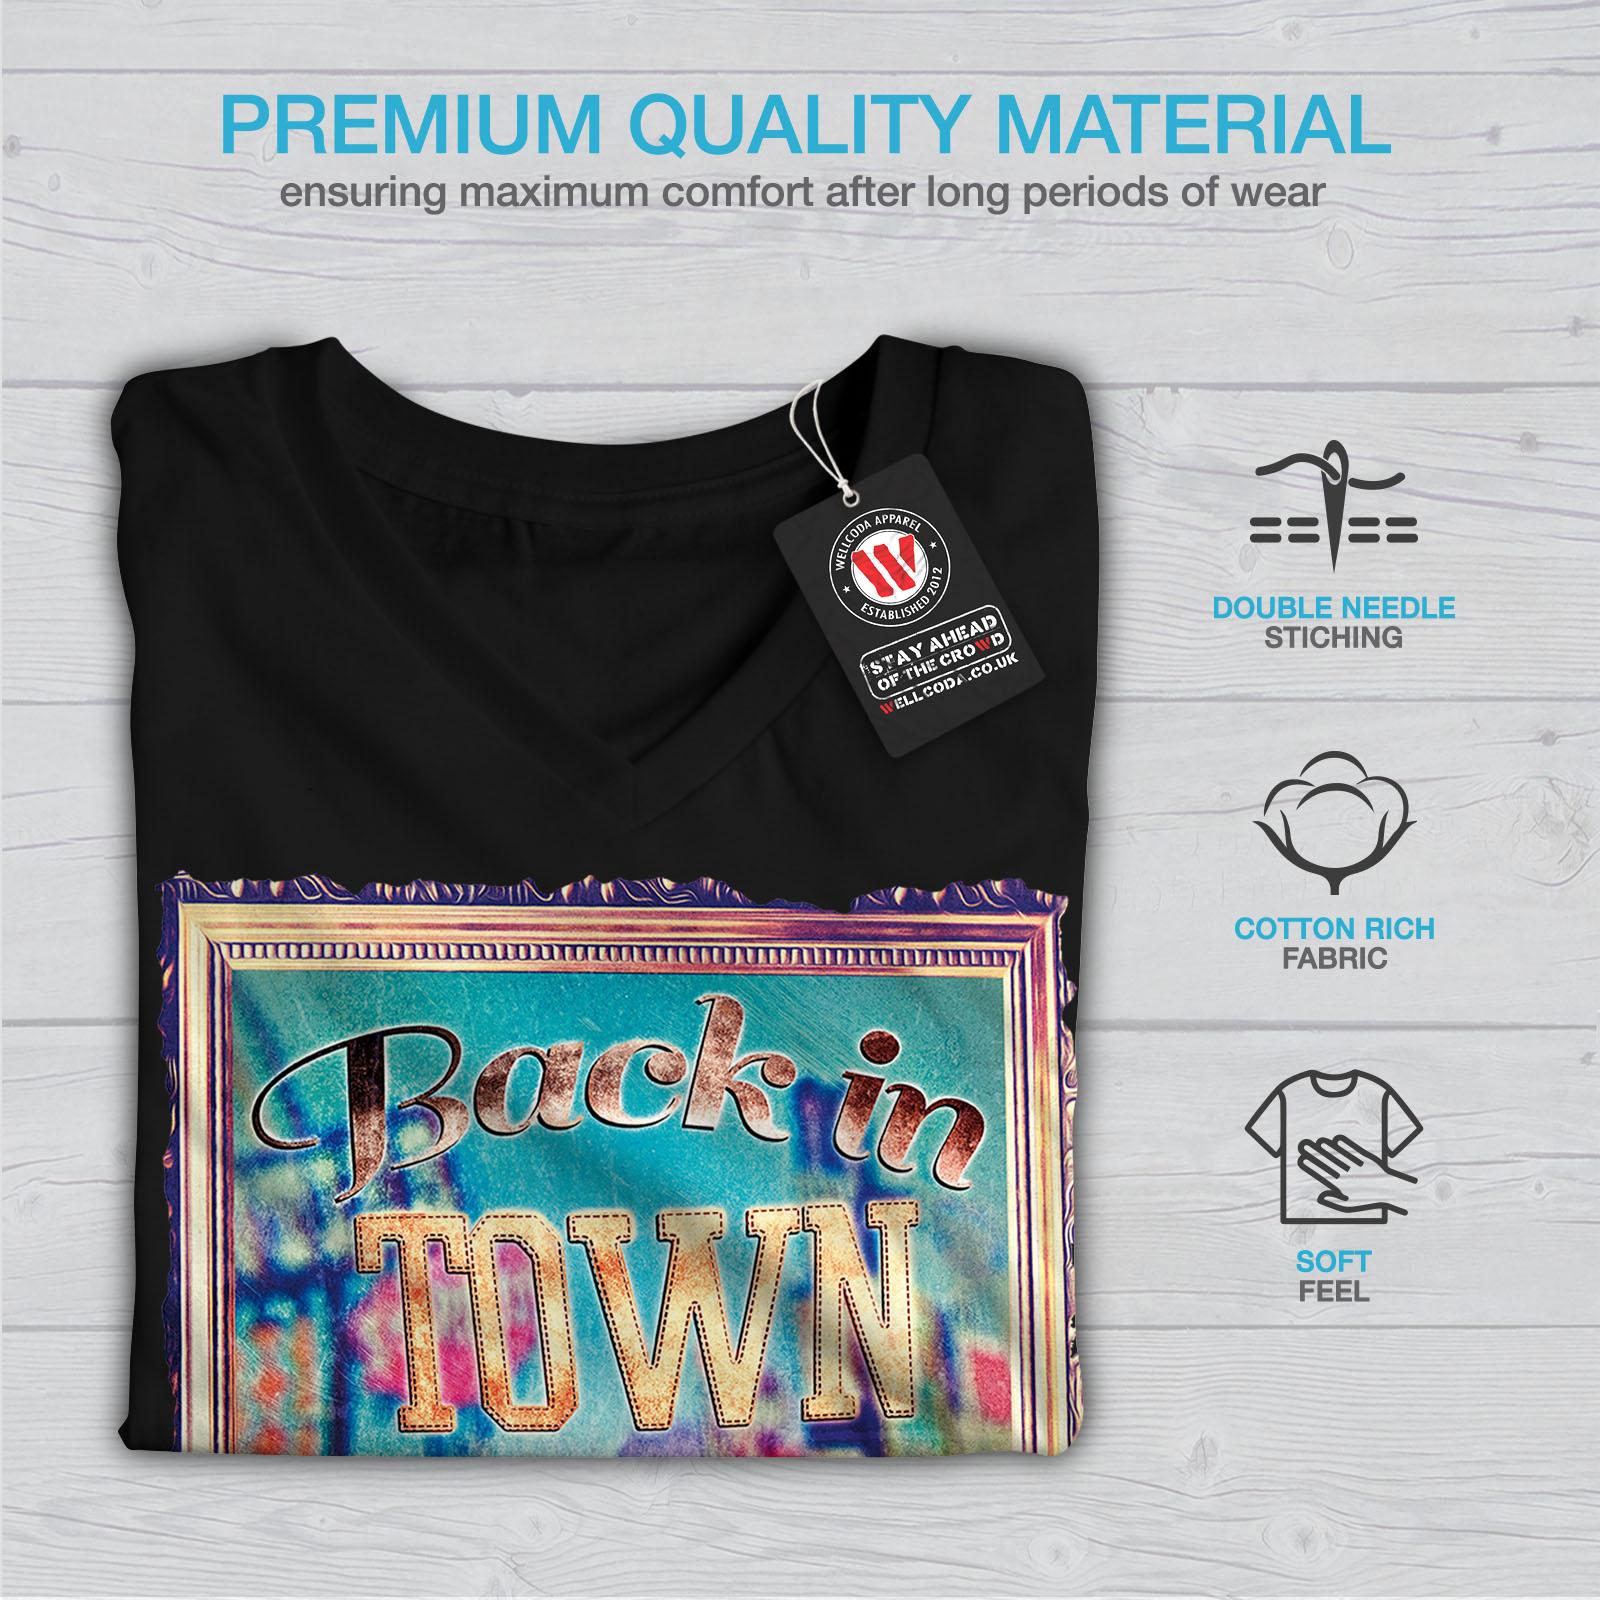 Wellcoda-Back-In-Town-Joke-Womens-V-Neck-T-shirt-Monkey-Graphic-Design-Tee thumbnail 5